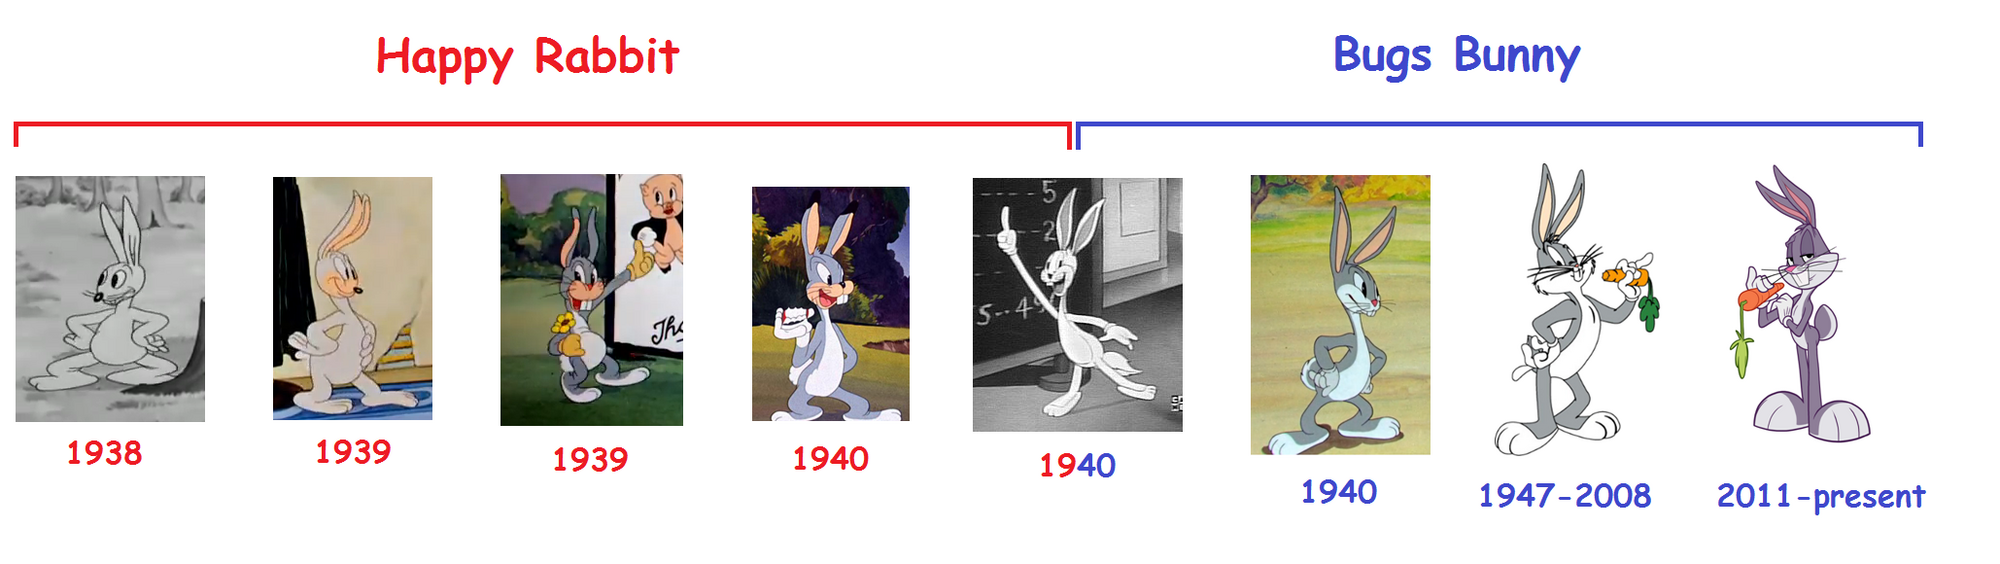 List of Bugs Bunny cartoons   Looney Tunes Wiki   FANDOM powered by ...